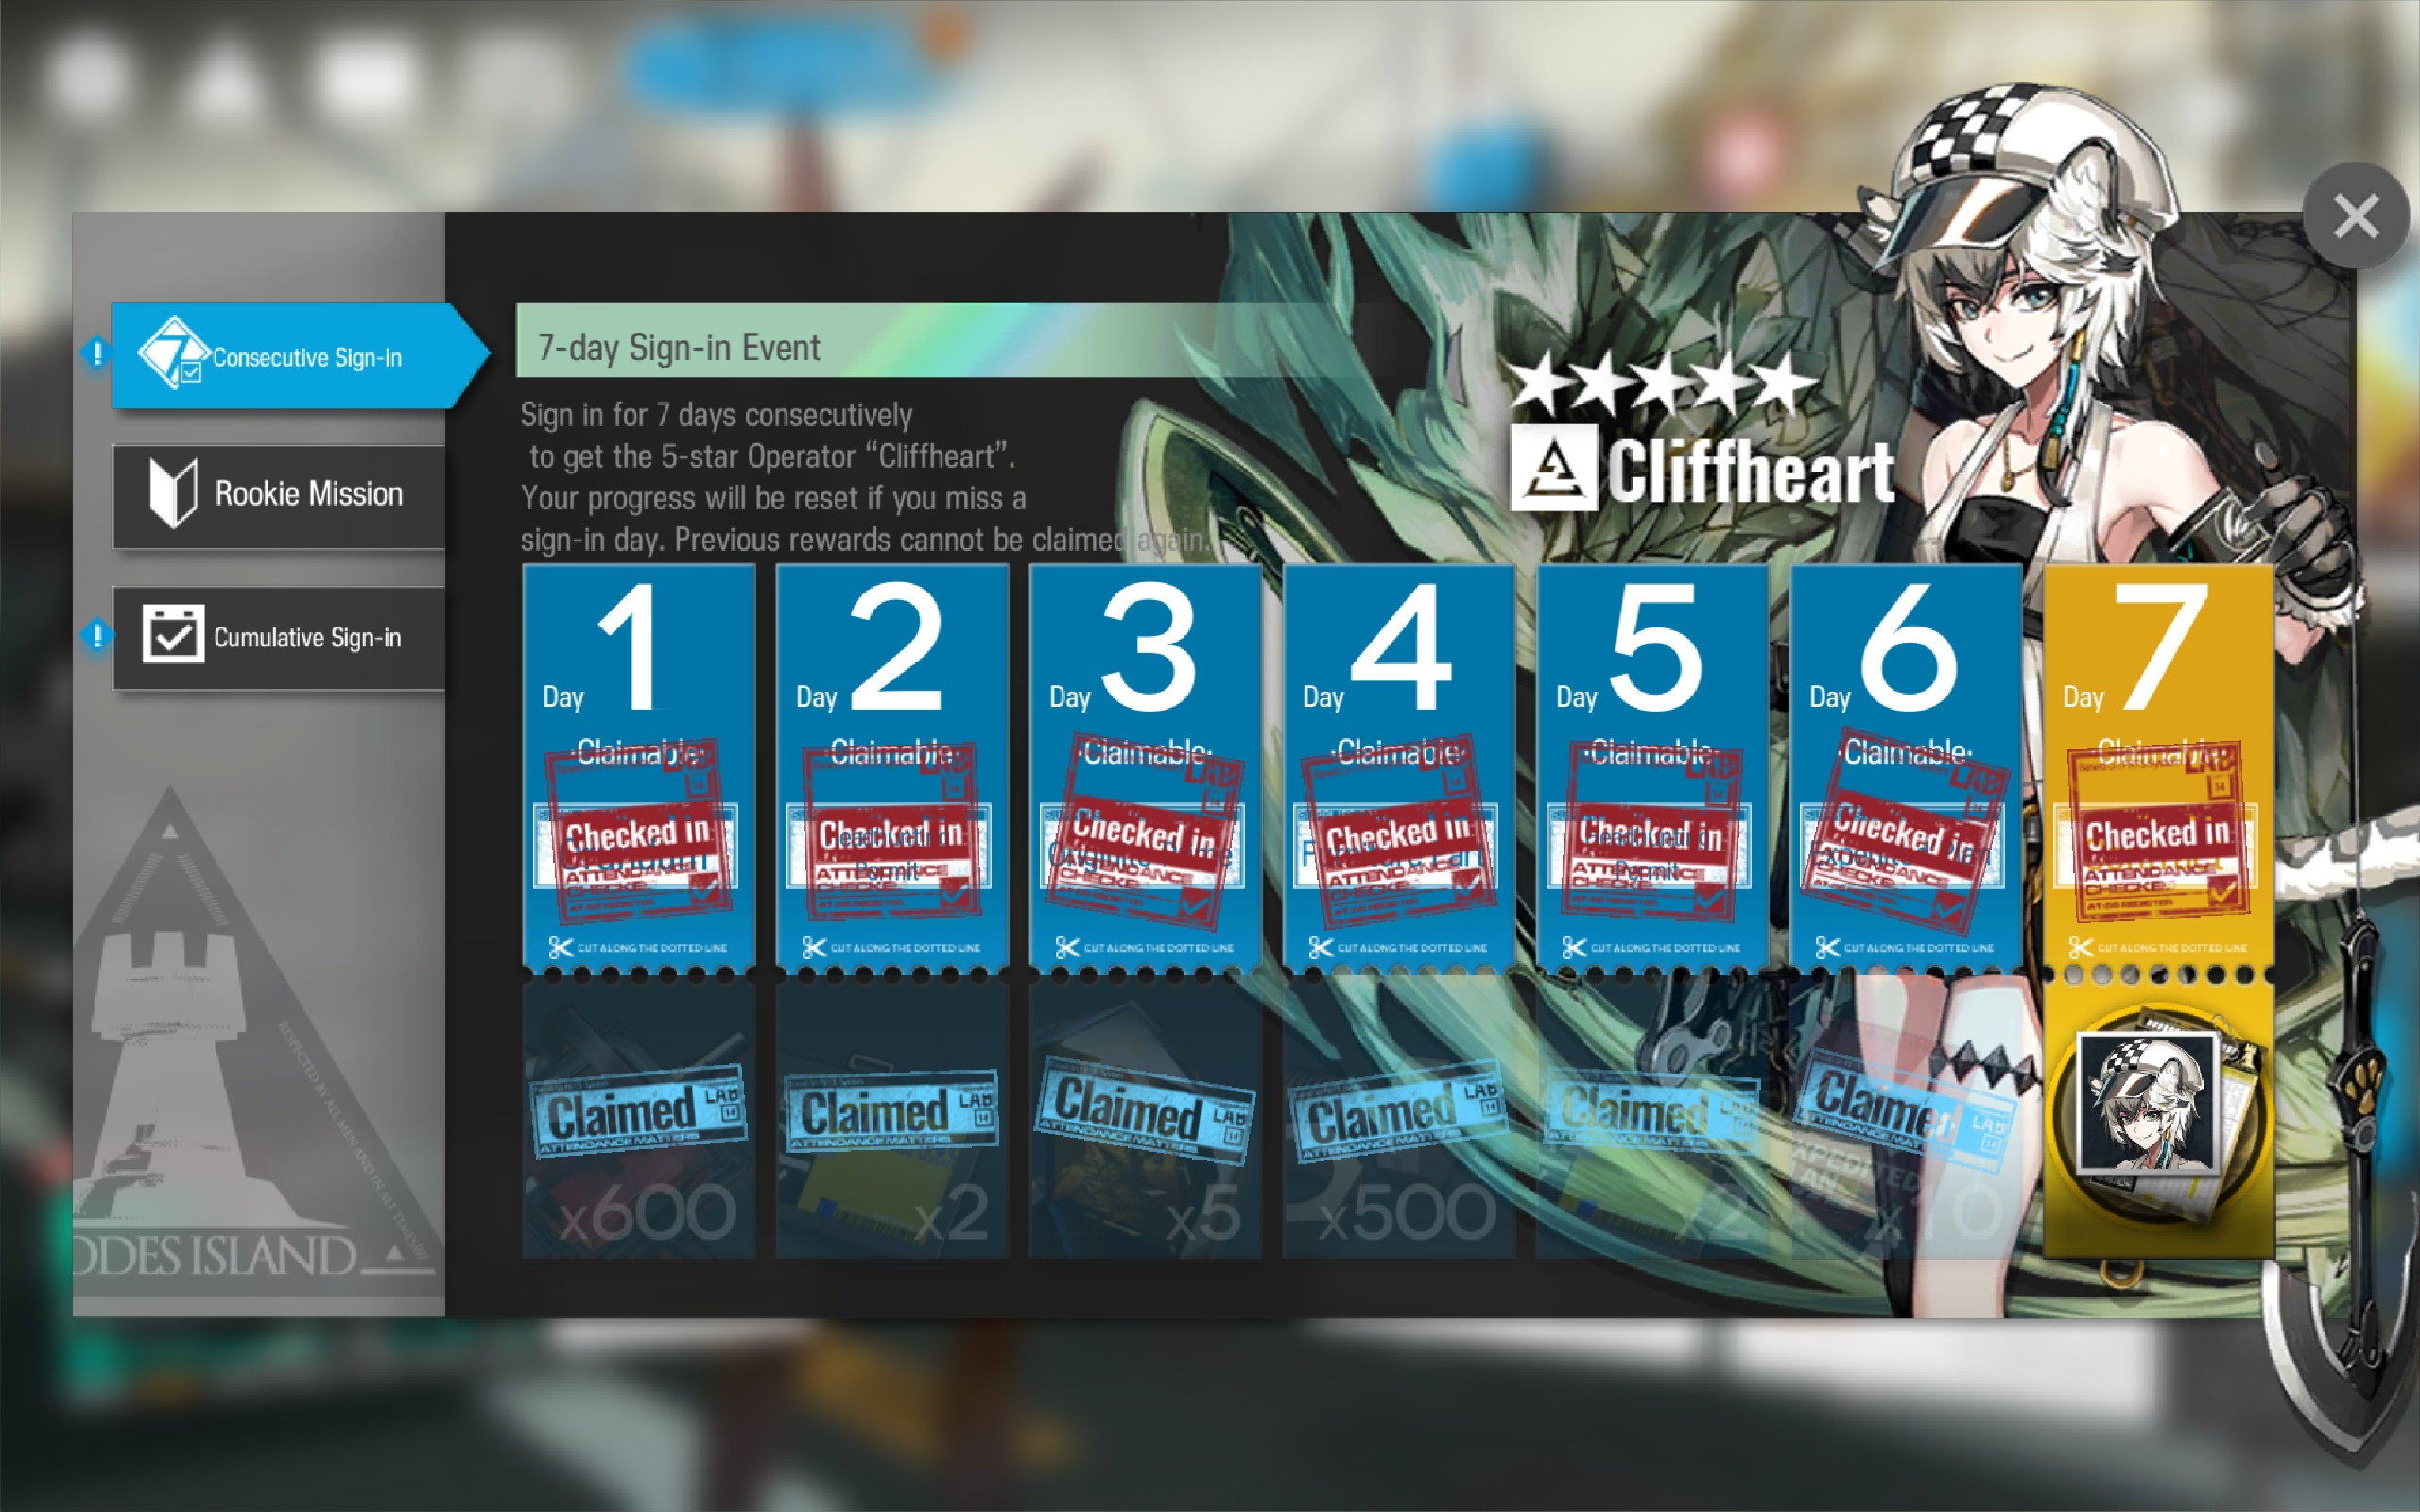 operador cliffheart 7 dias seguidos arknights